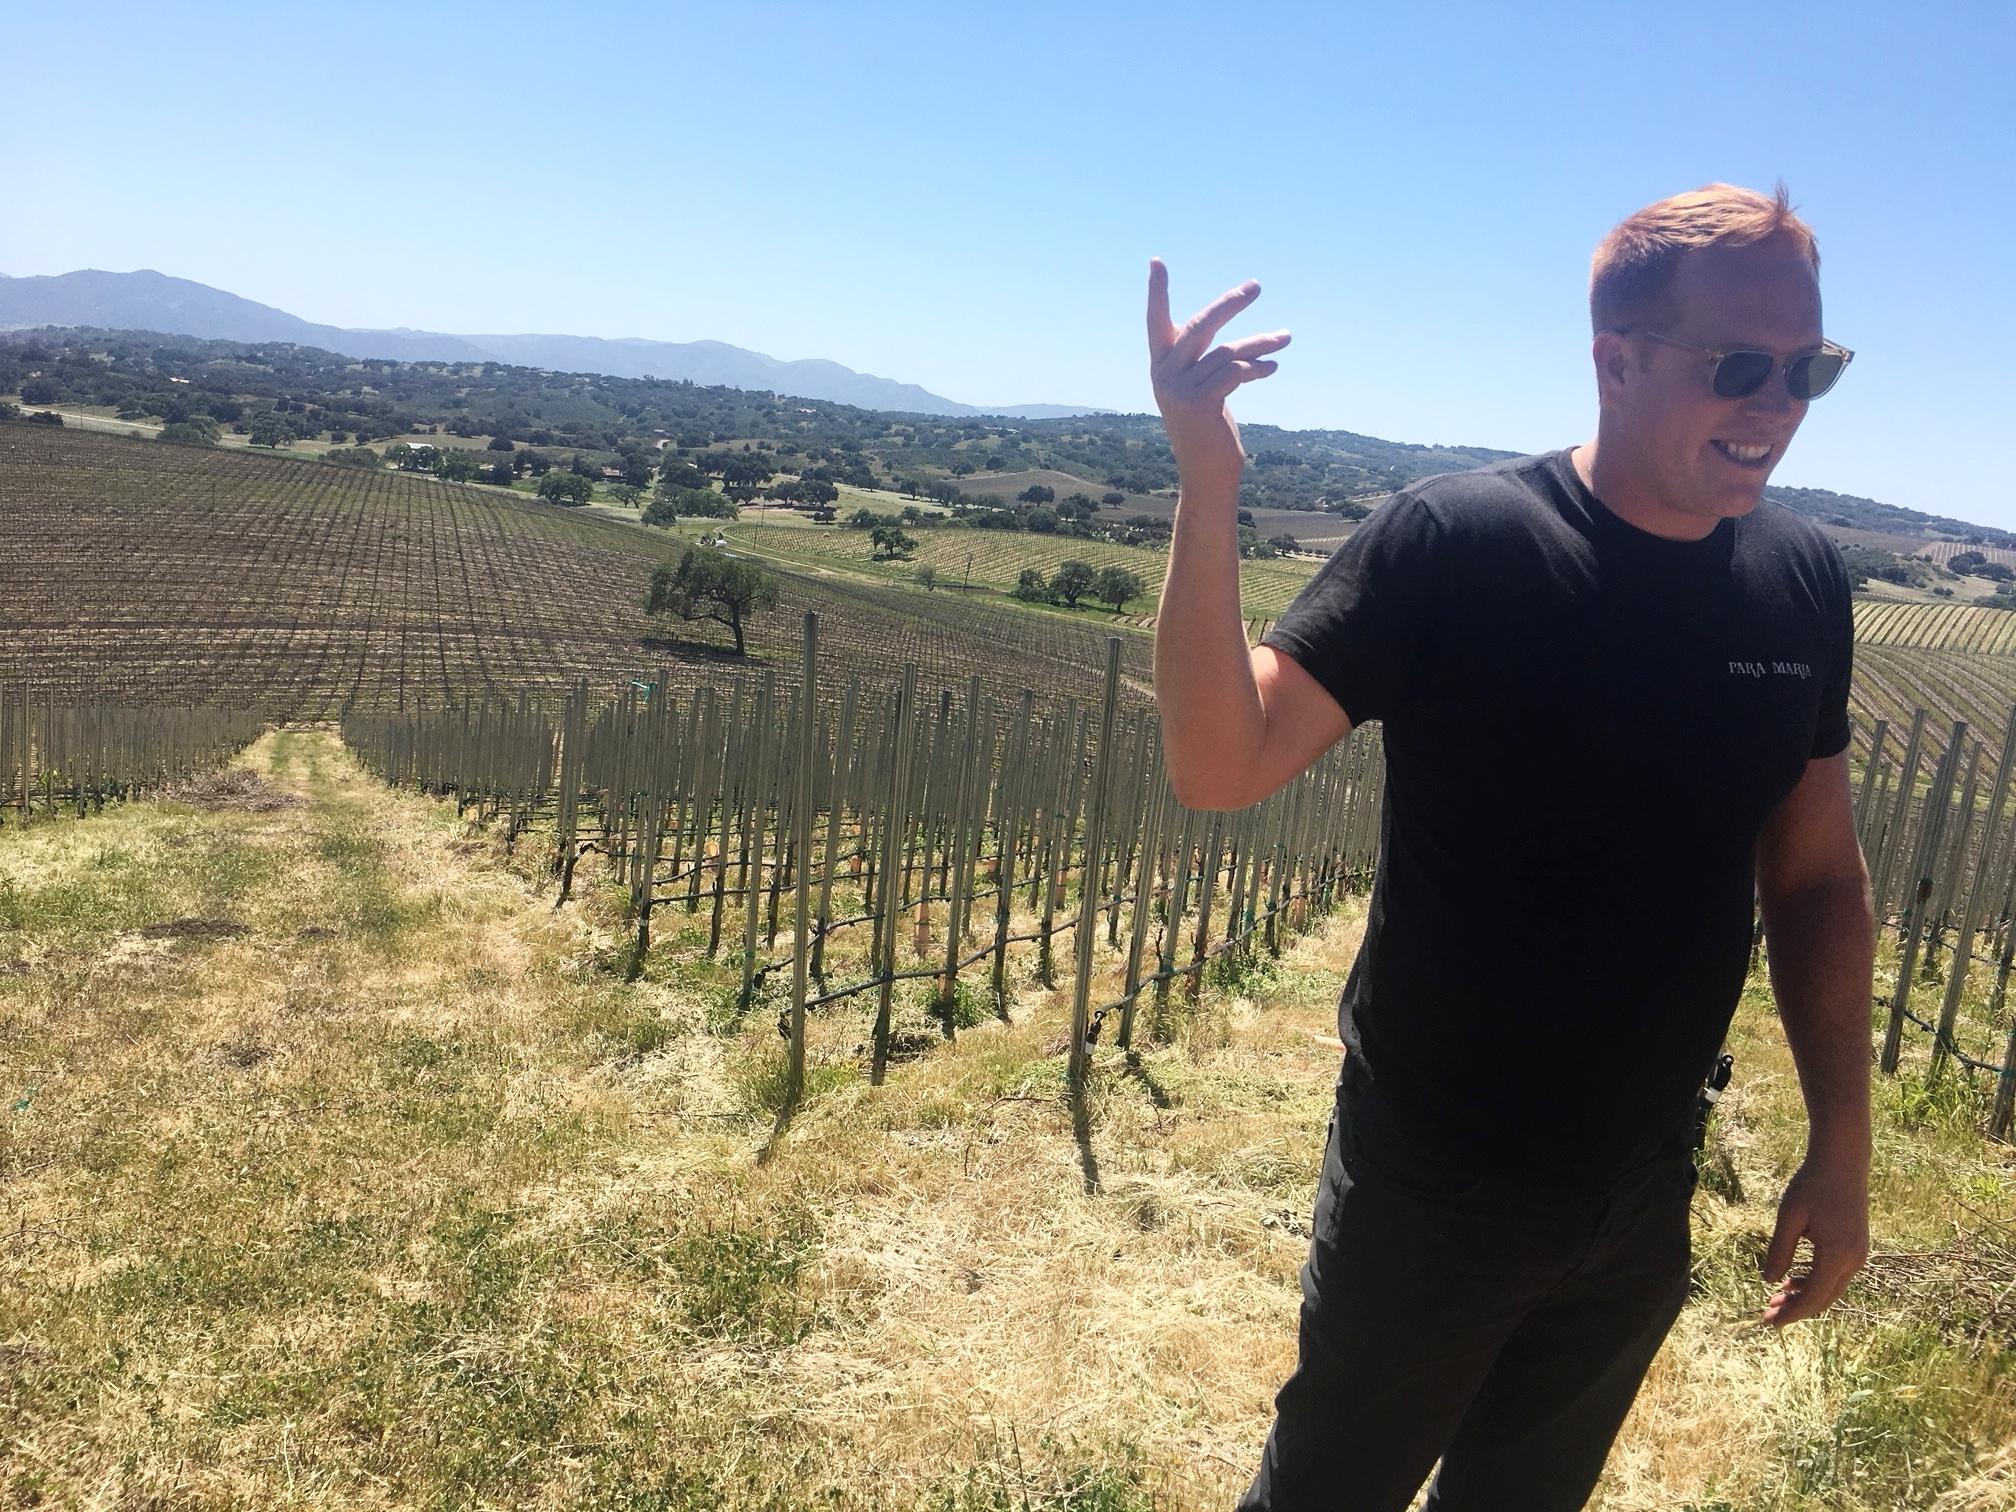 Pete Stolpman showing us around the Stolpman Vineyards in Ballard Canyon